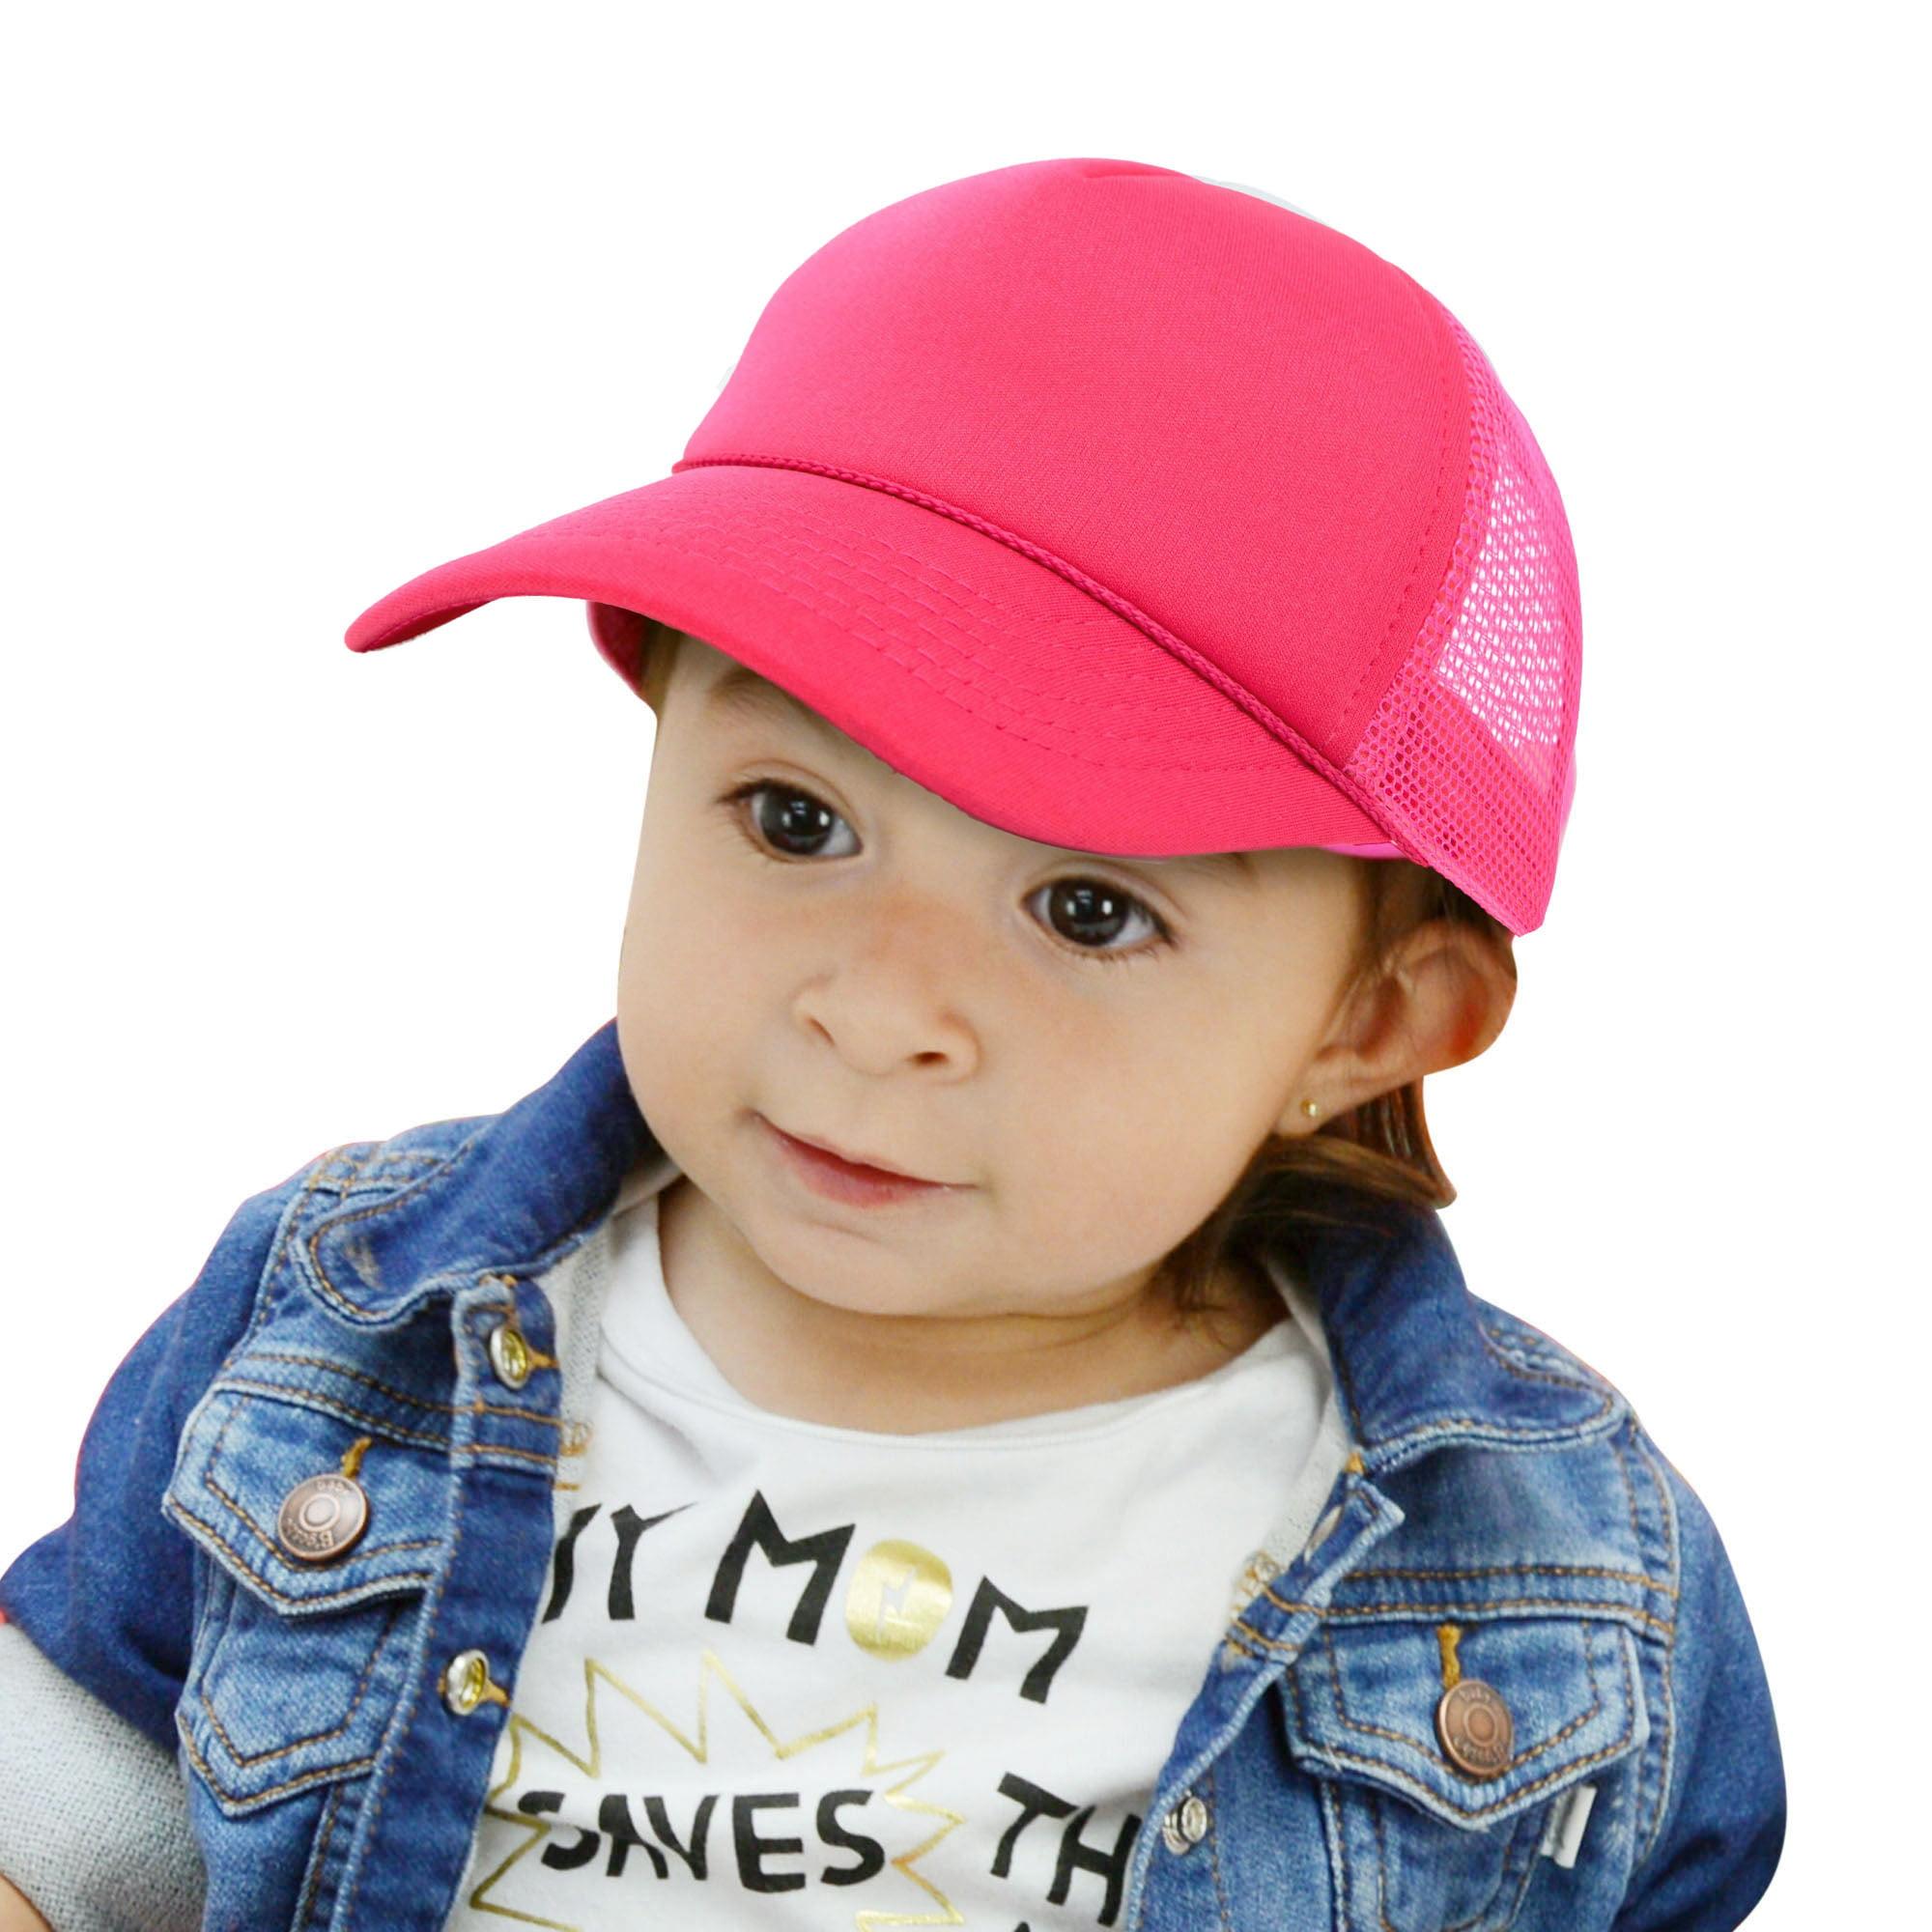 Dalix Dalix Infant Trucker Hat Baby Cap Tiny Extra Small Girls Boys In Gold White Walmart Com Walmart Com